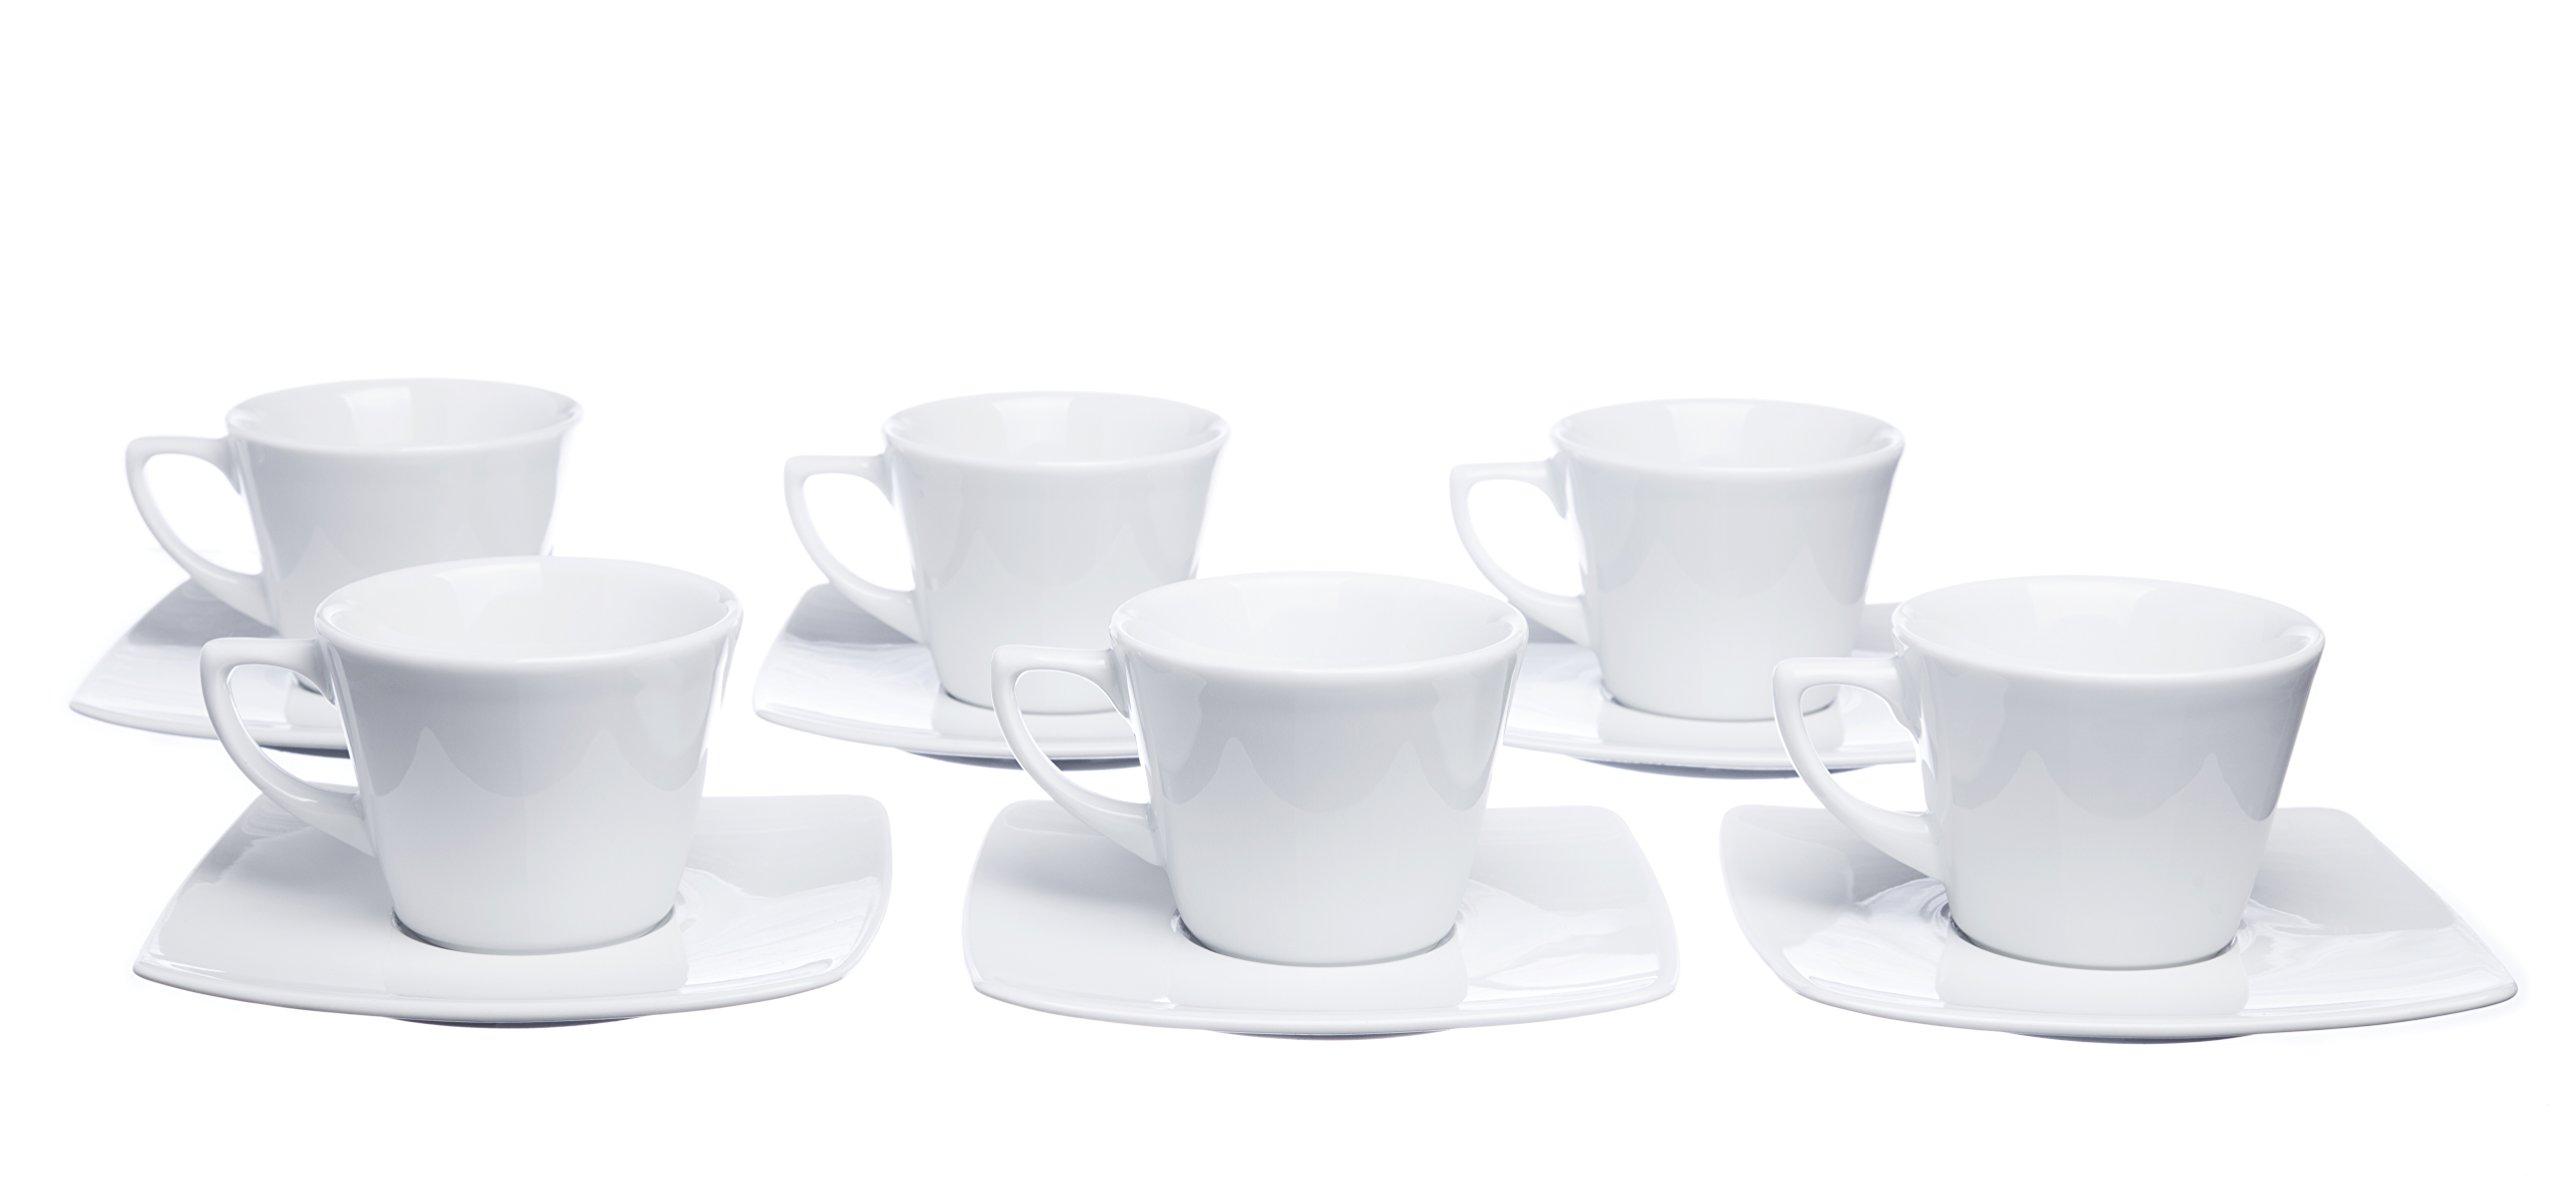 MOKKO 12-Piece Coffee/Espresso 2.5 oz. CUPS Set with Square Saucers (Set of 6), White Porcelain, Restaurant&Hotel Quality